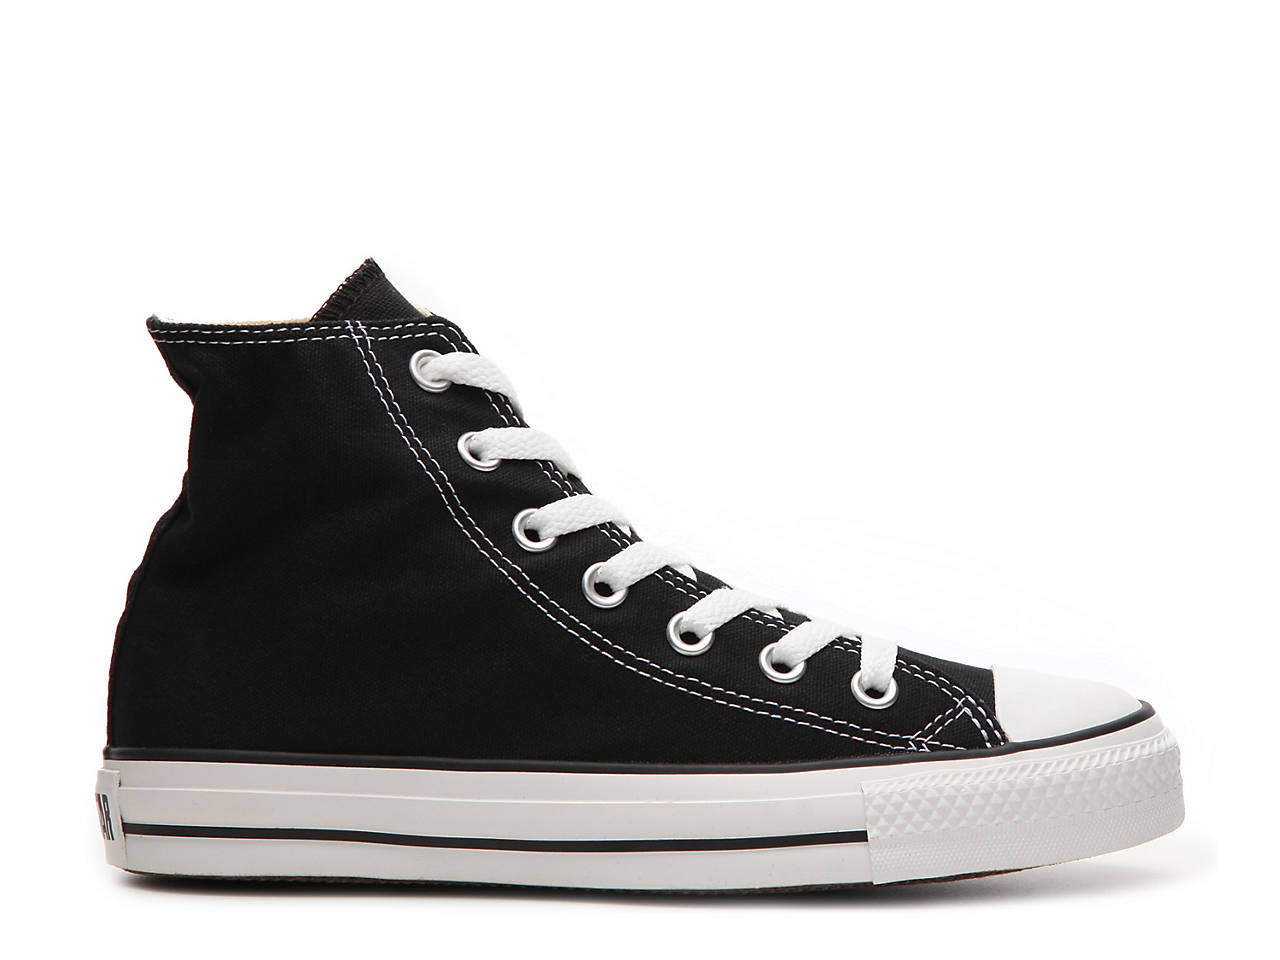 Converse Chuck Taylor All Star High-Top Sneaker - Women s Women s ... 98e3cc1a7176